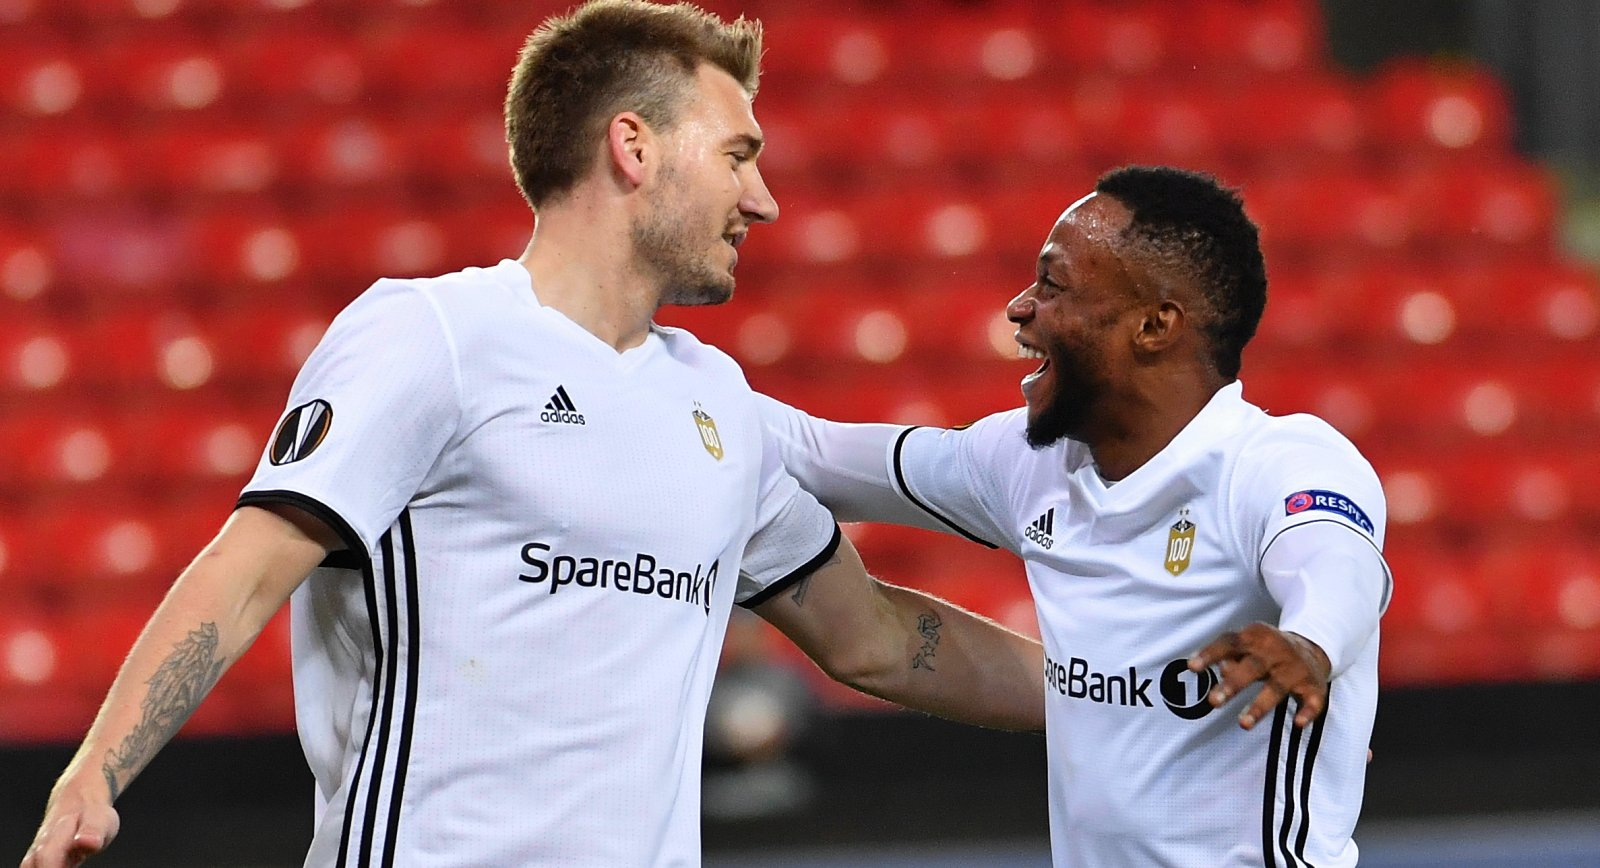 UCL Qualifying: Adegbenro Helps Rosenborg BK Reach Playoffs; Azubuike, Esiti, Akpom Ousted